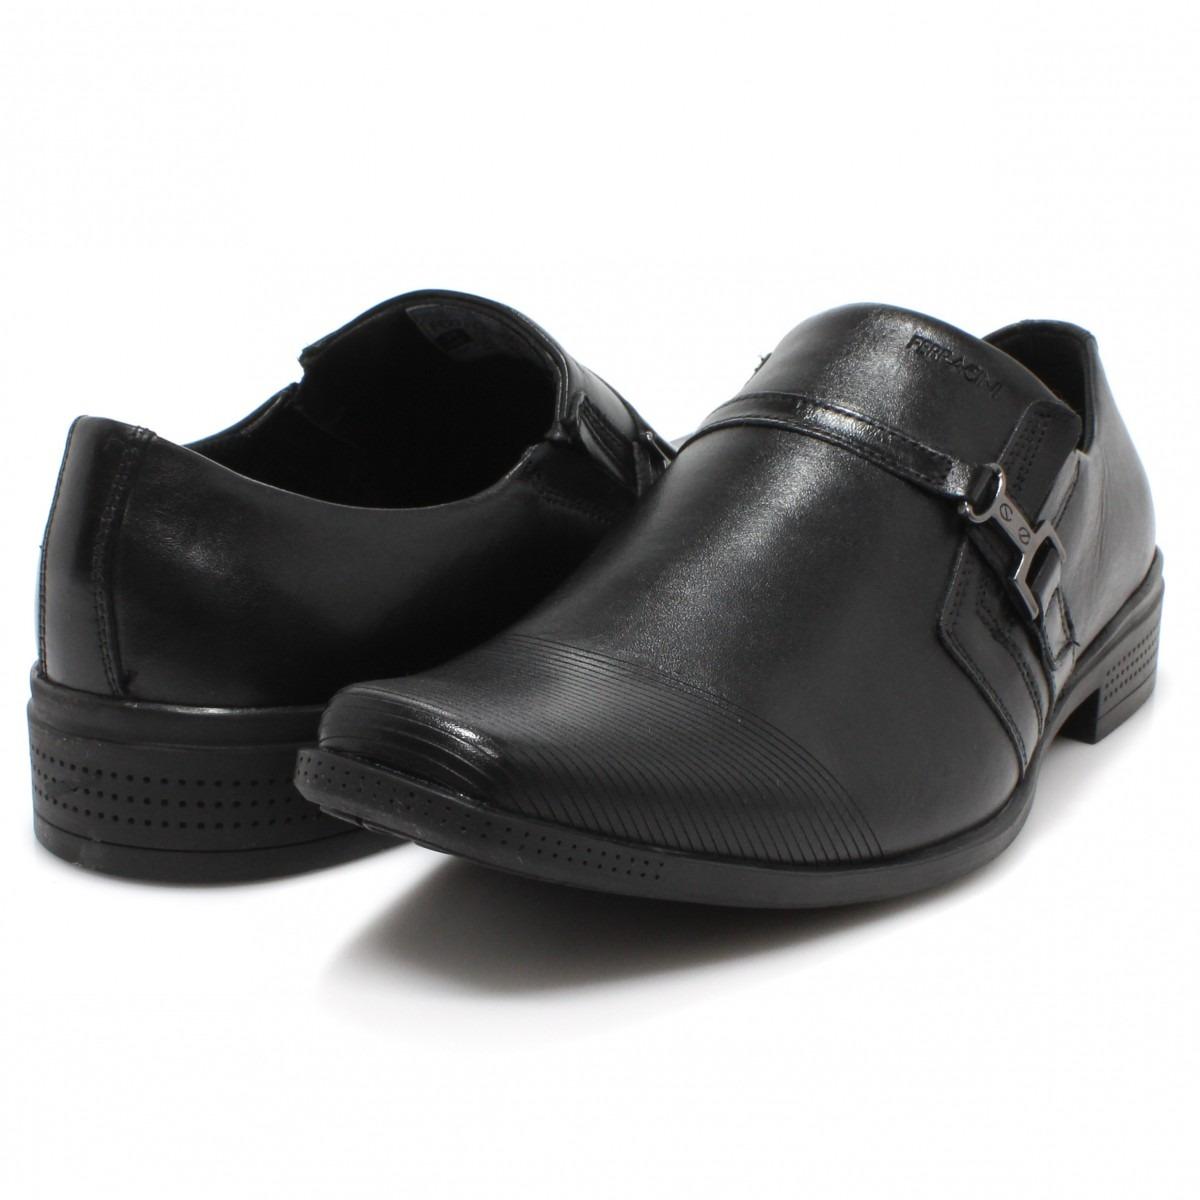 b6aea31c3c Sapato Masculino Ferracini Social Frankfurt 4352